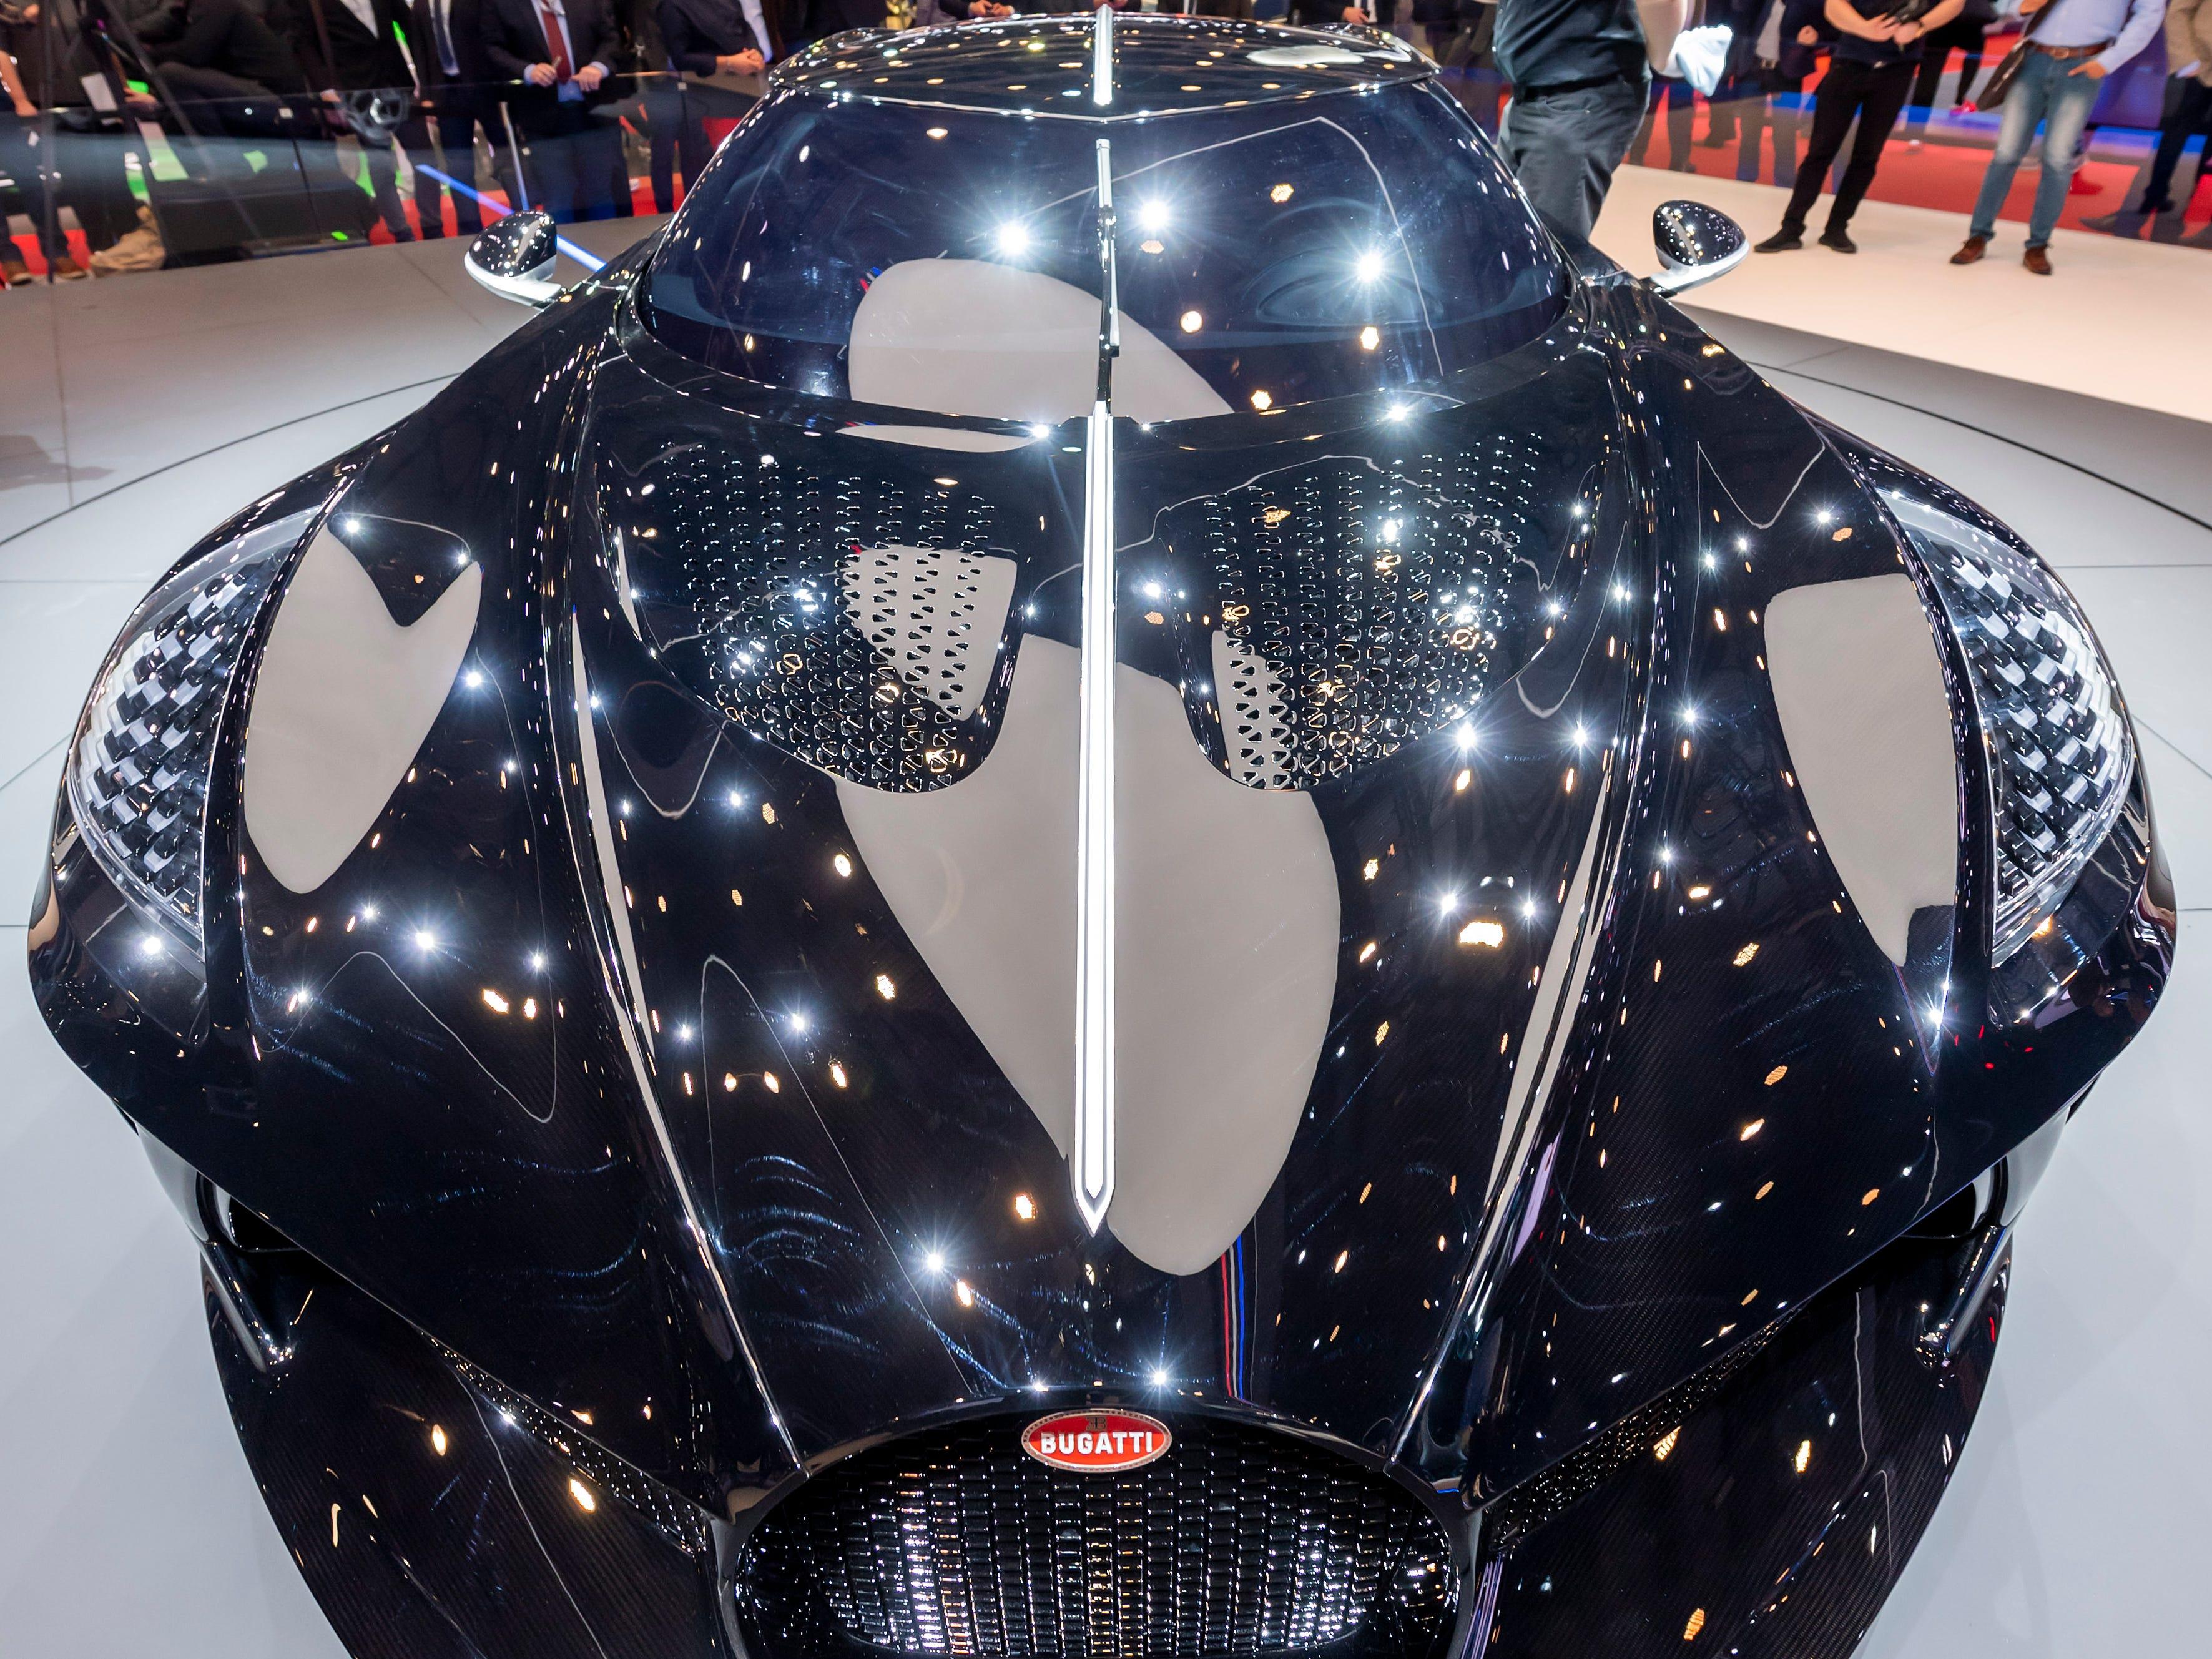 The new car Bugatti La Voiture Noire is on display in Geneva.